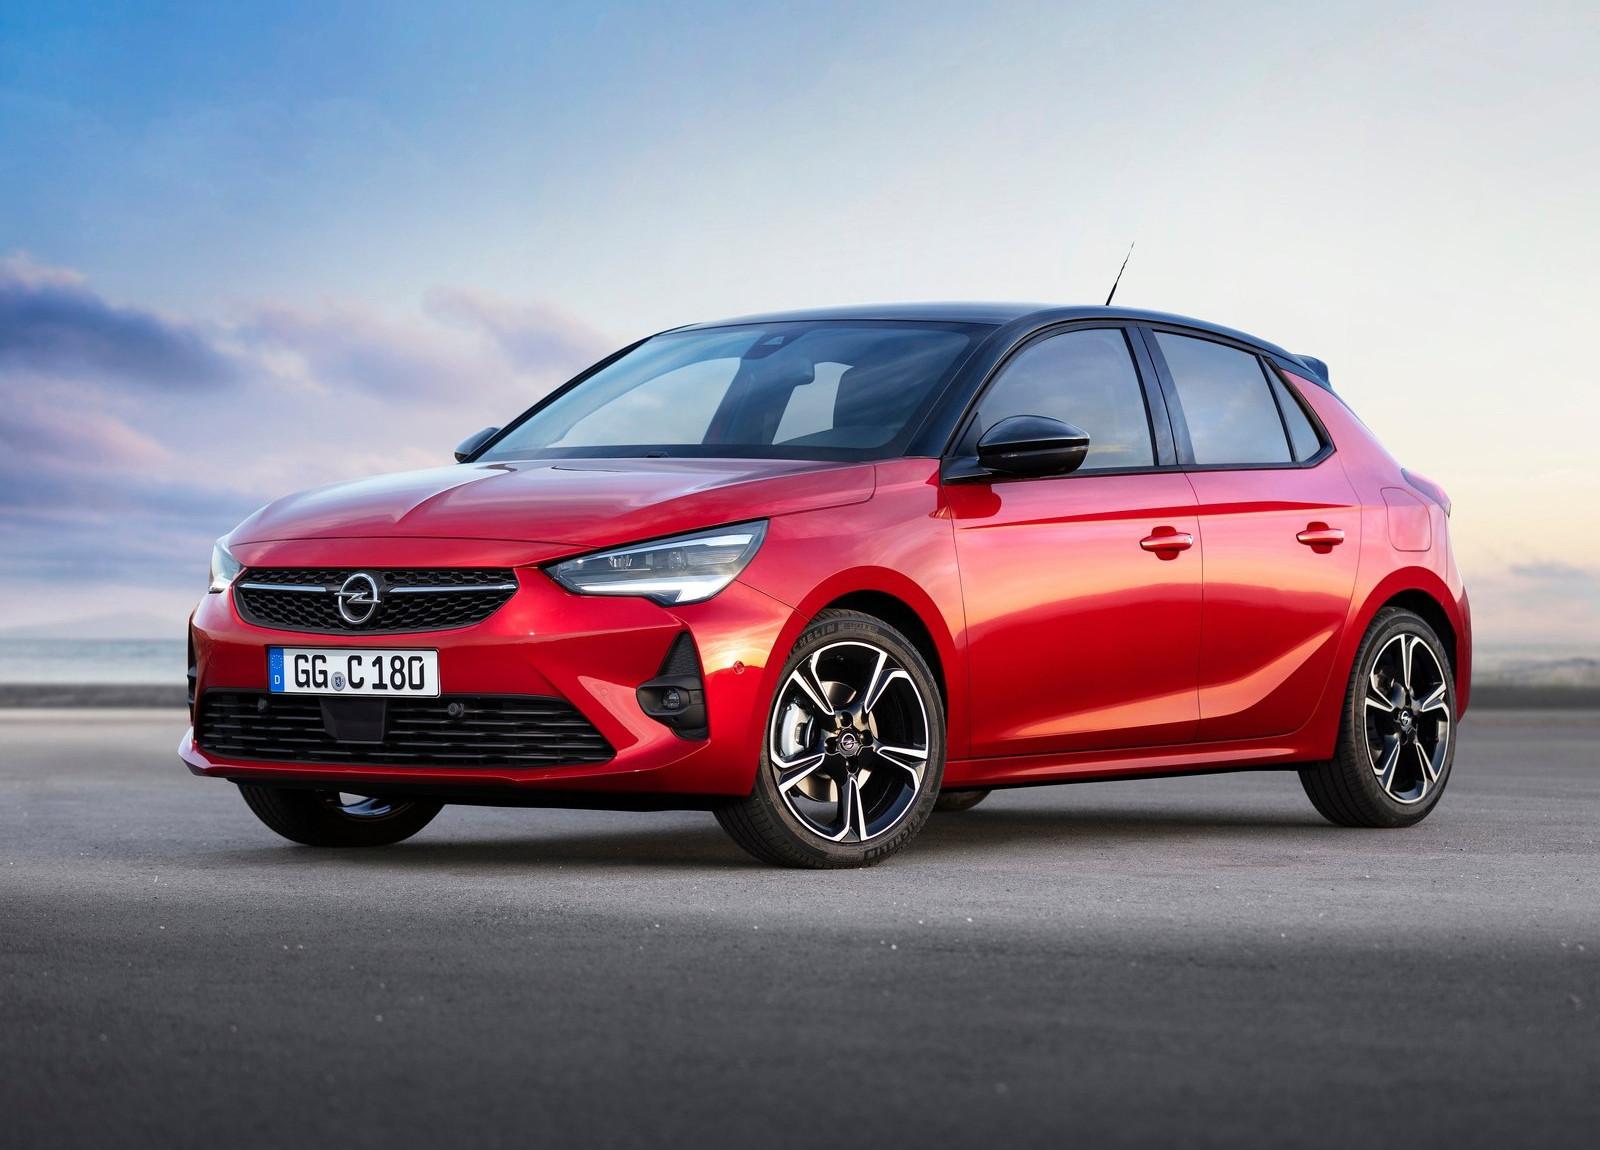 Opel - Vauxhall Corsa